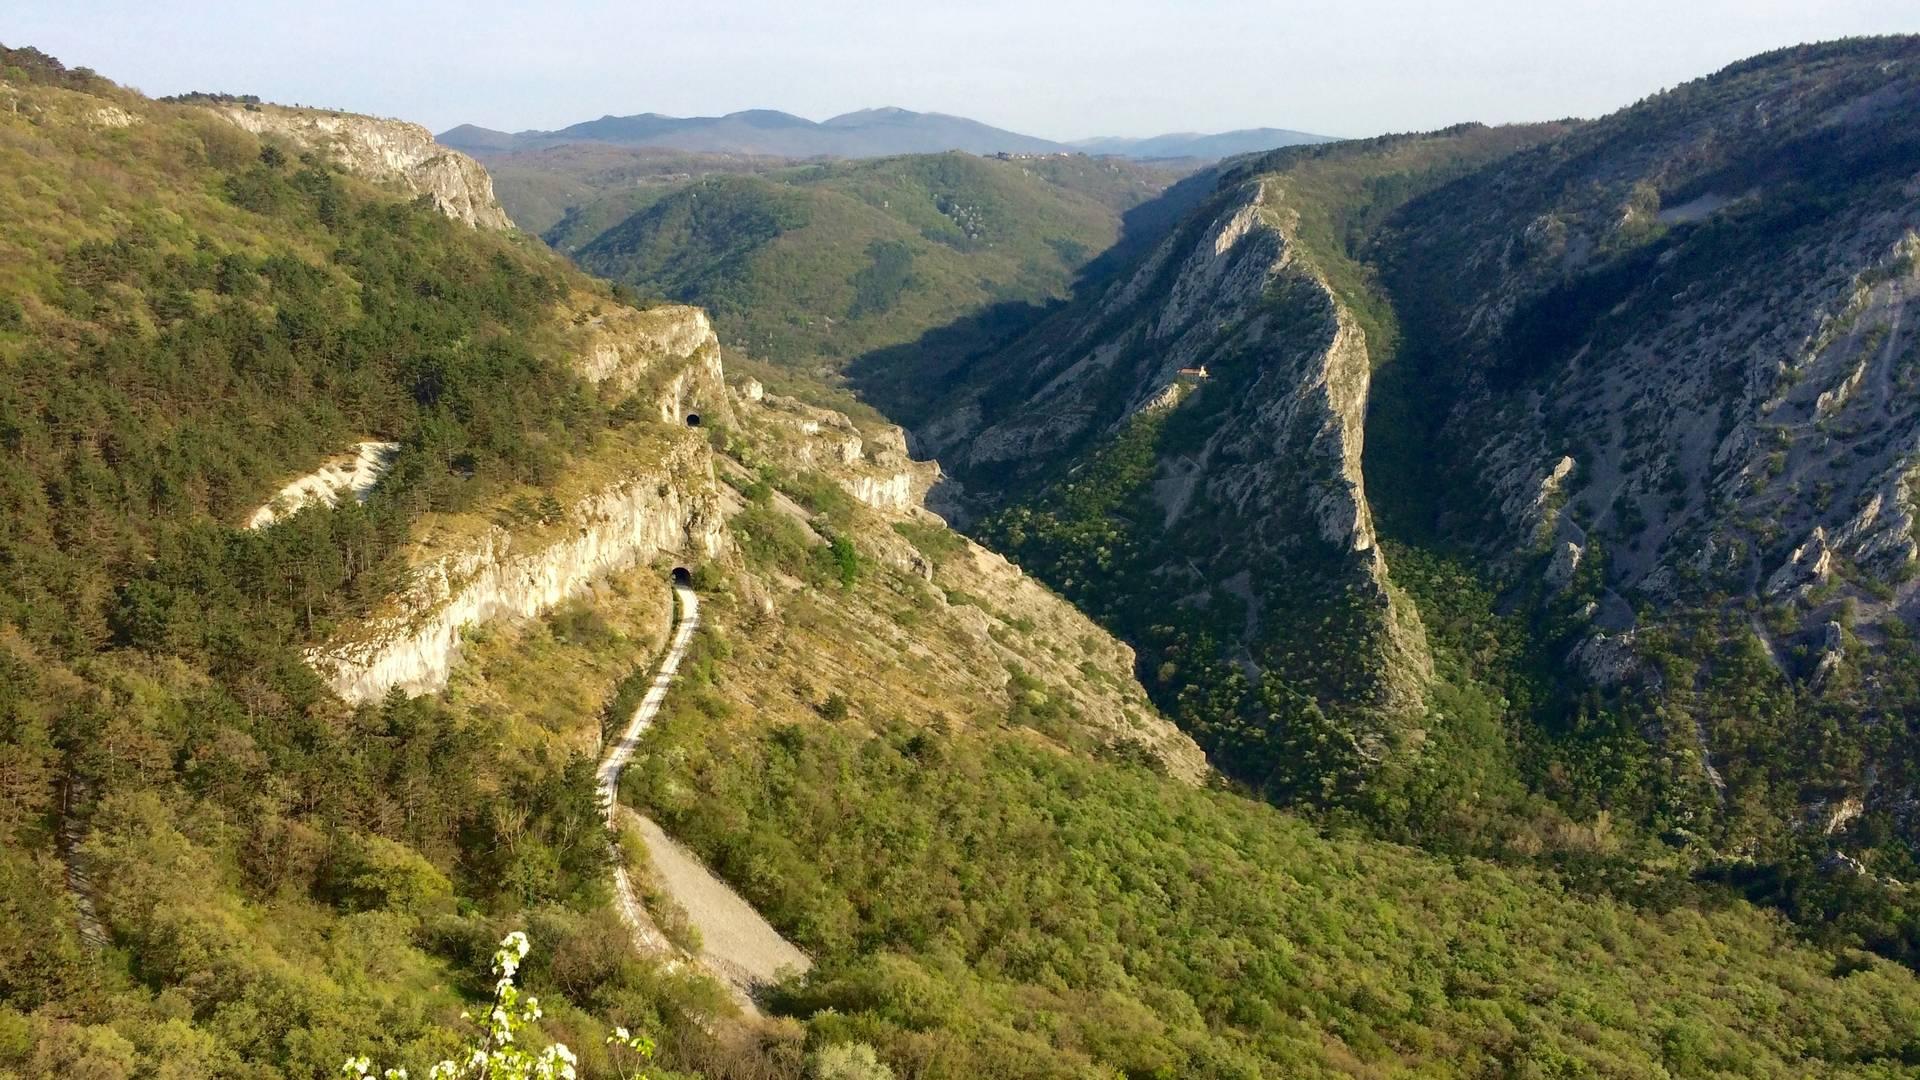 Ausblick auf das Val Rosandra